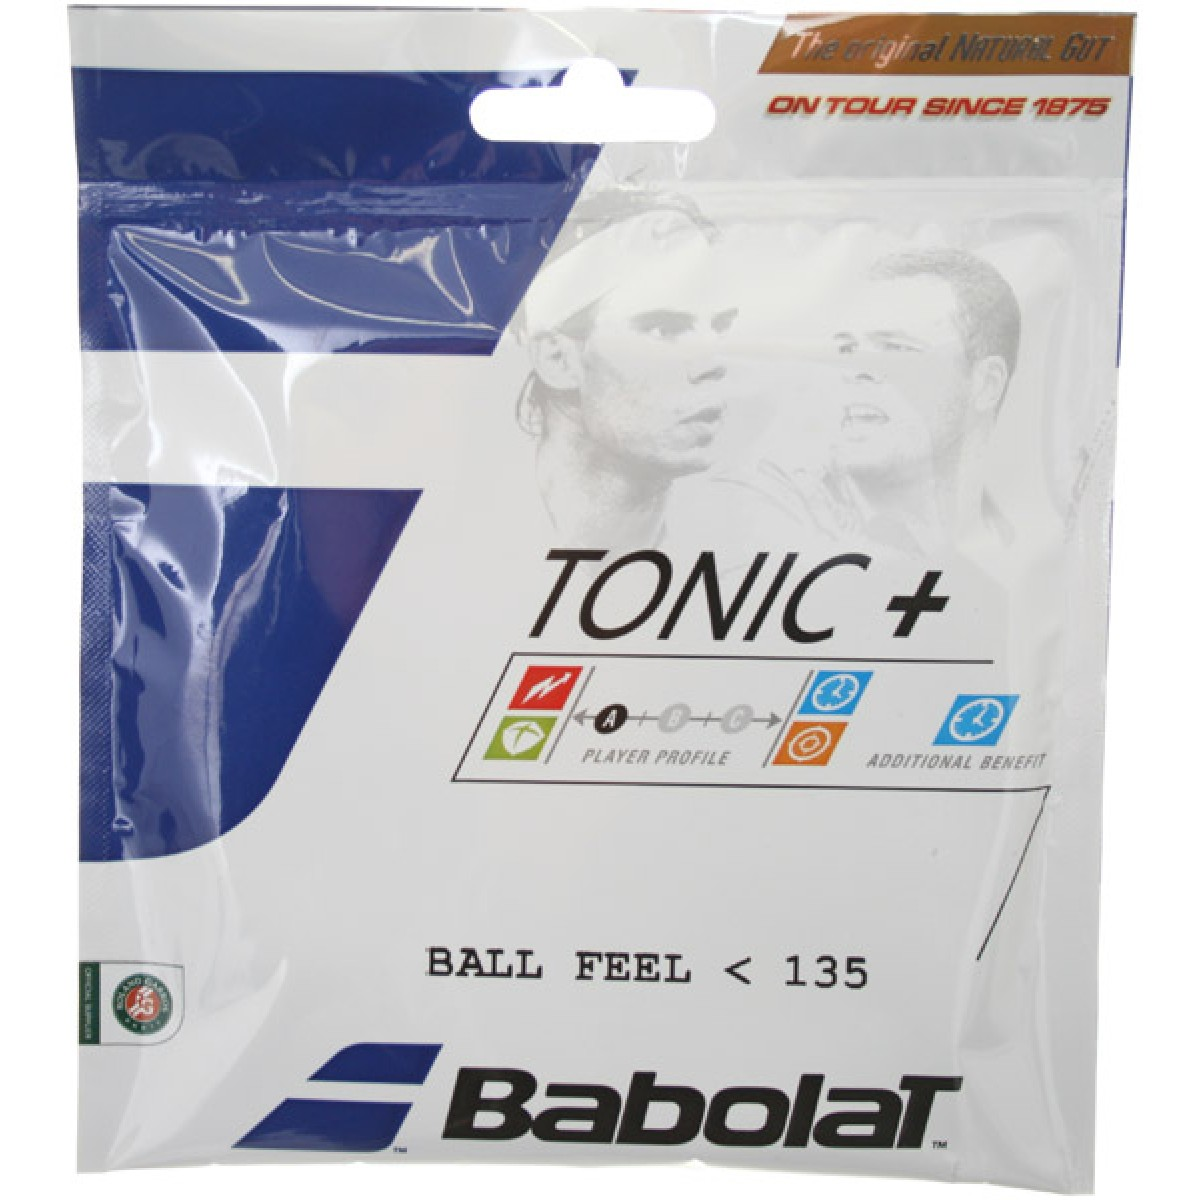 CORDAJE BABOLAT CUERDA NATURAL TONIC + BALL FEEL (12 METROS)